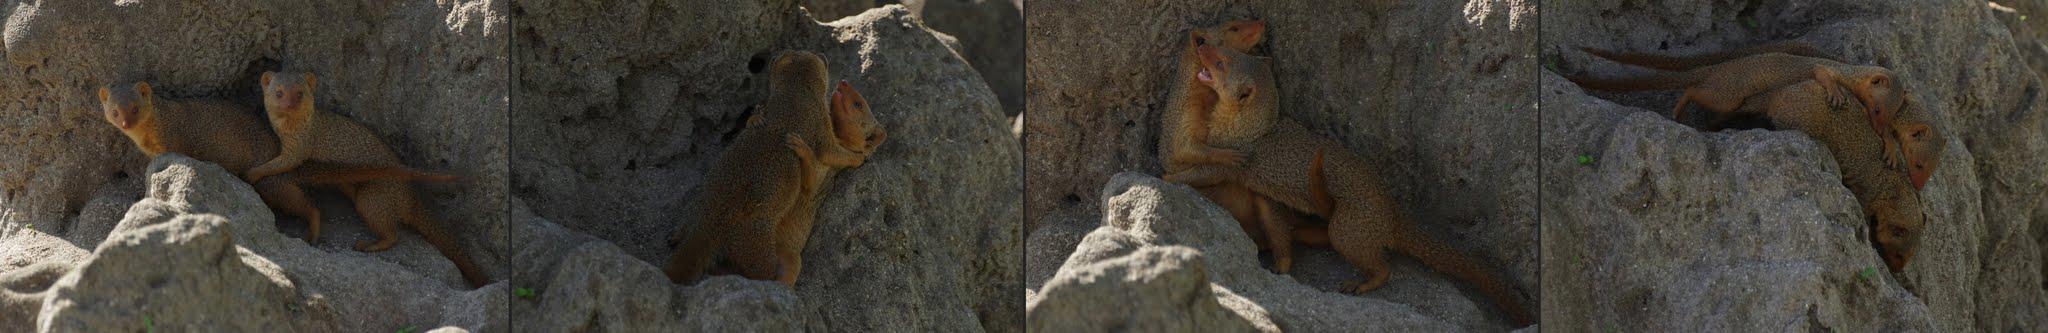 mangouste-naine-x-4-tarangire-11-15